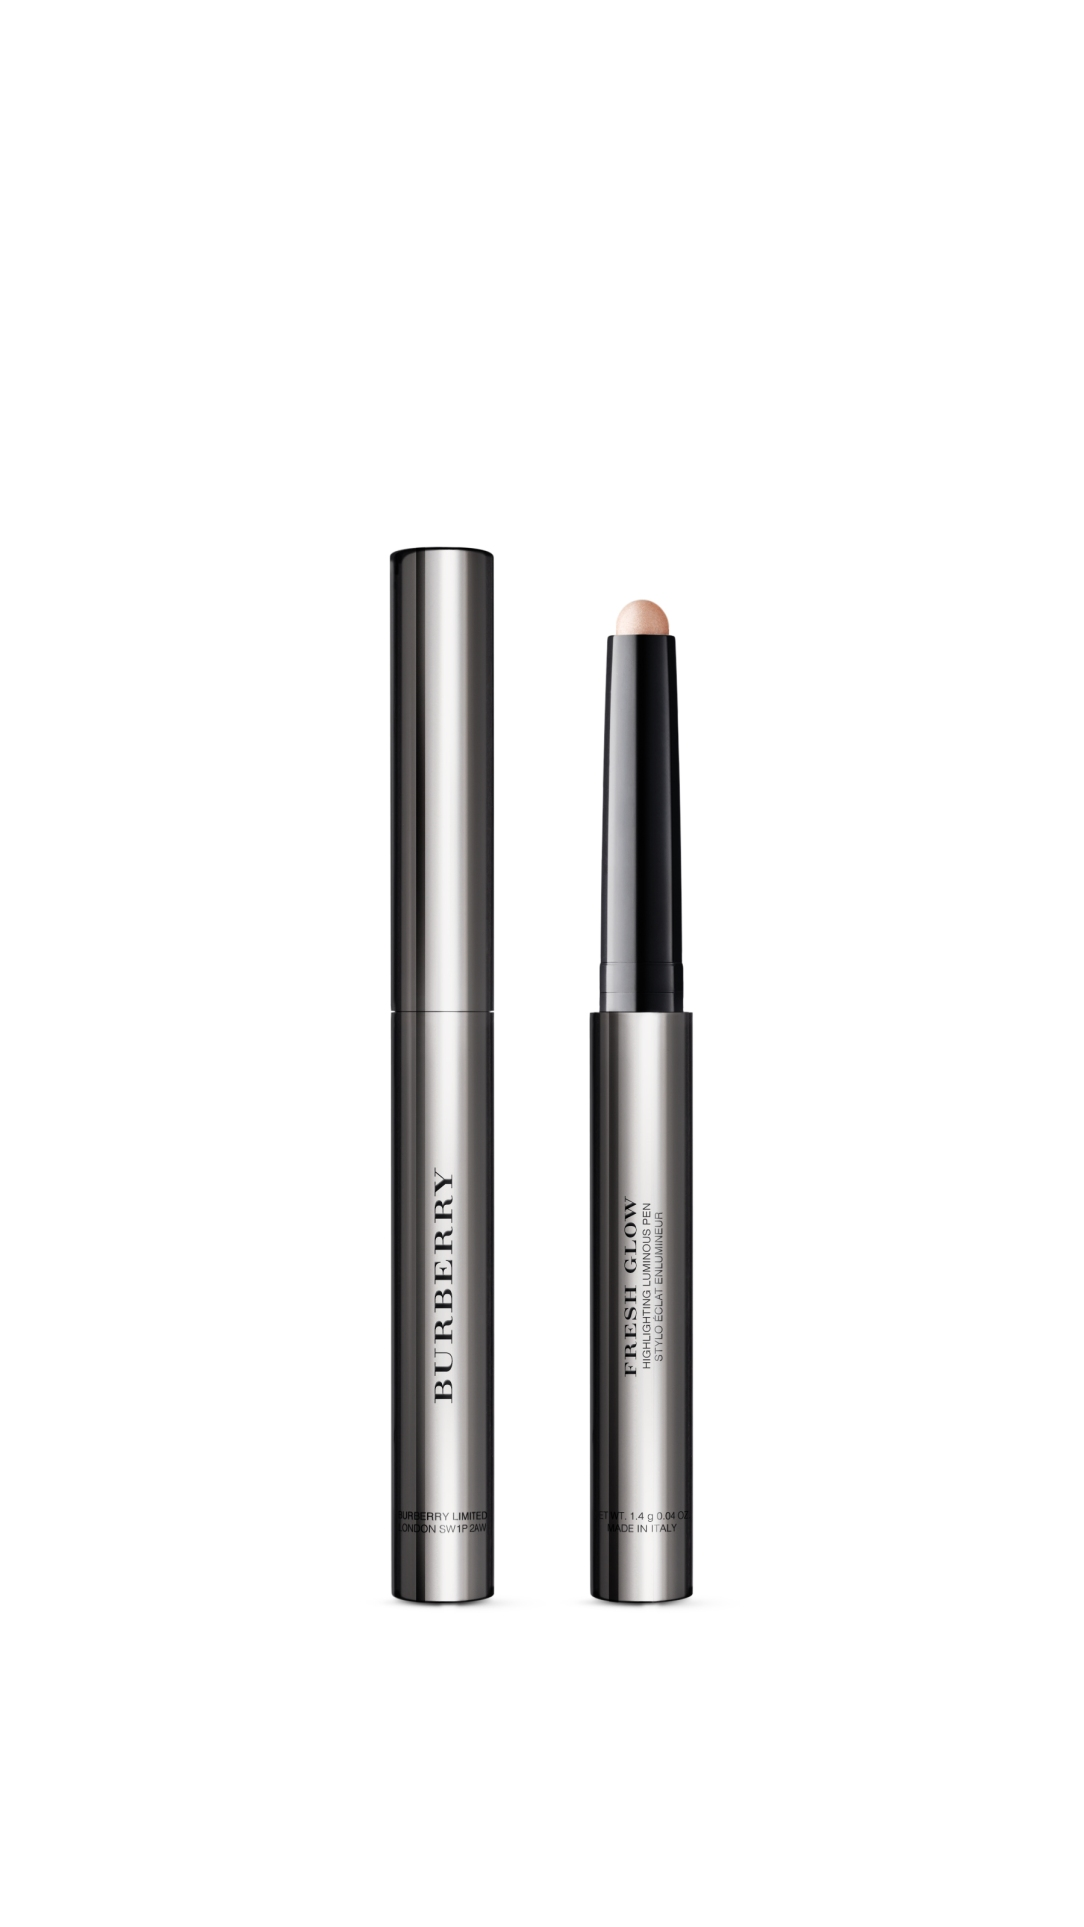 Fresh Glow Highlighting Luminous Pen - Nude Radiance